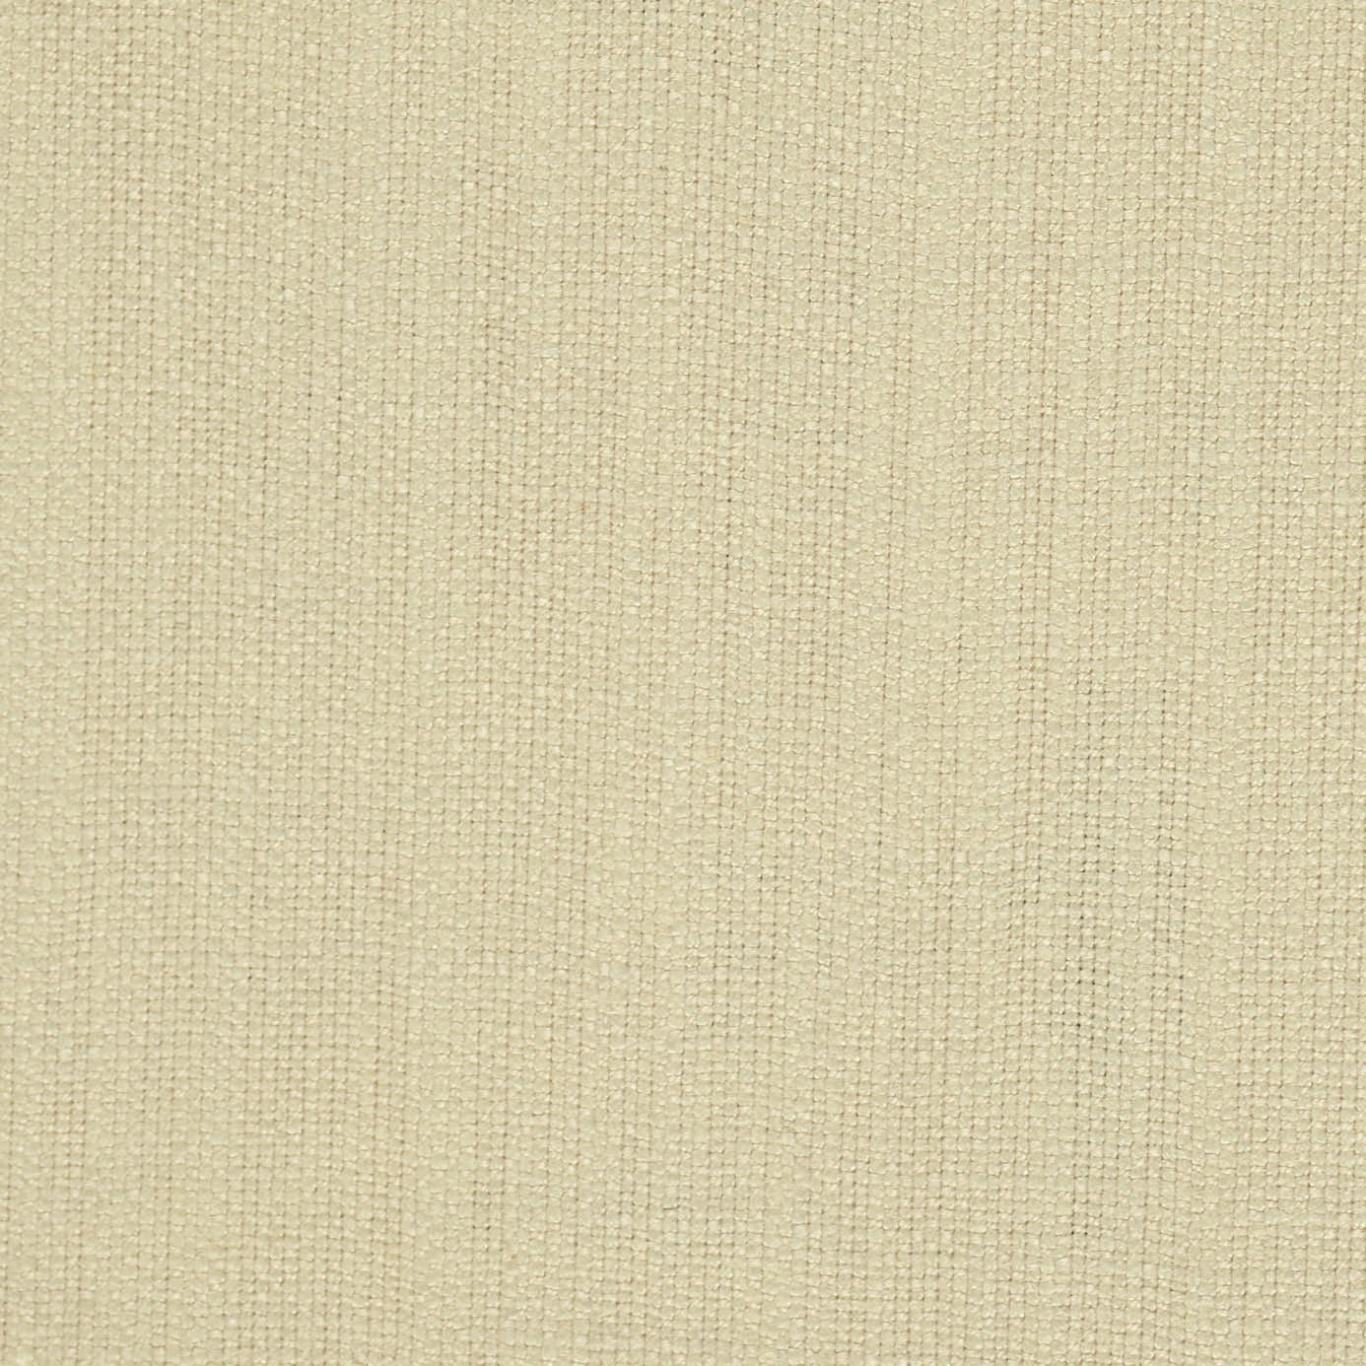 Image of Harlequin Atom Sand Fabric 440323